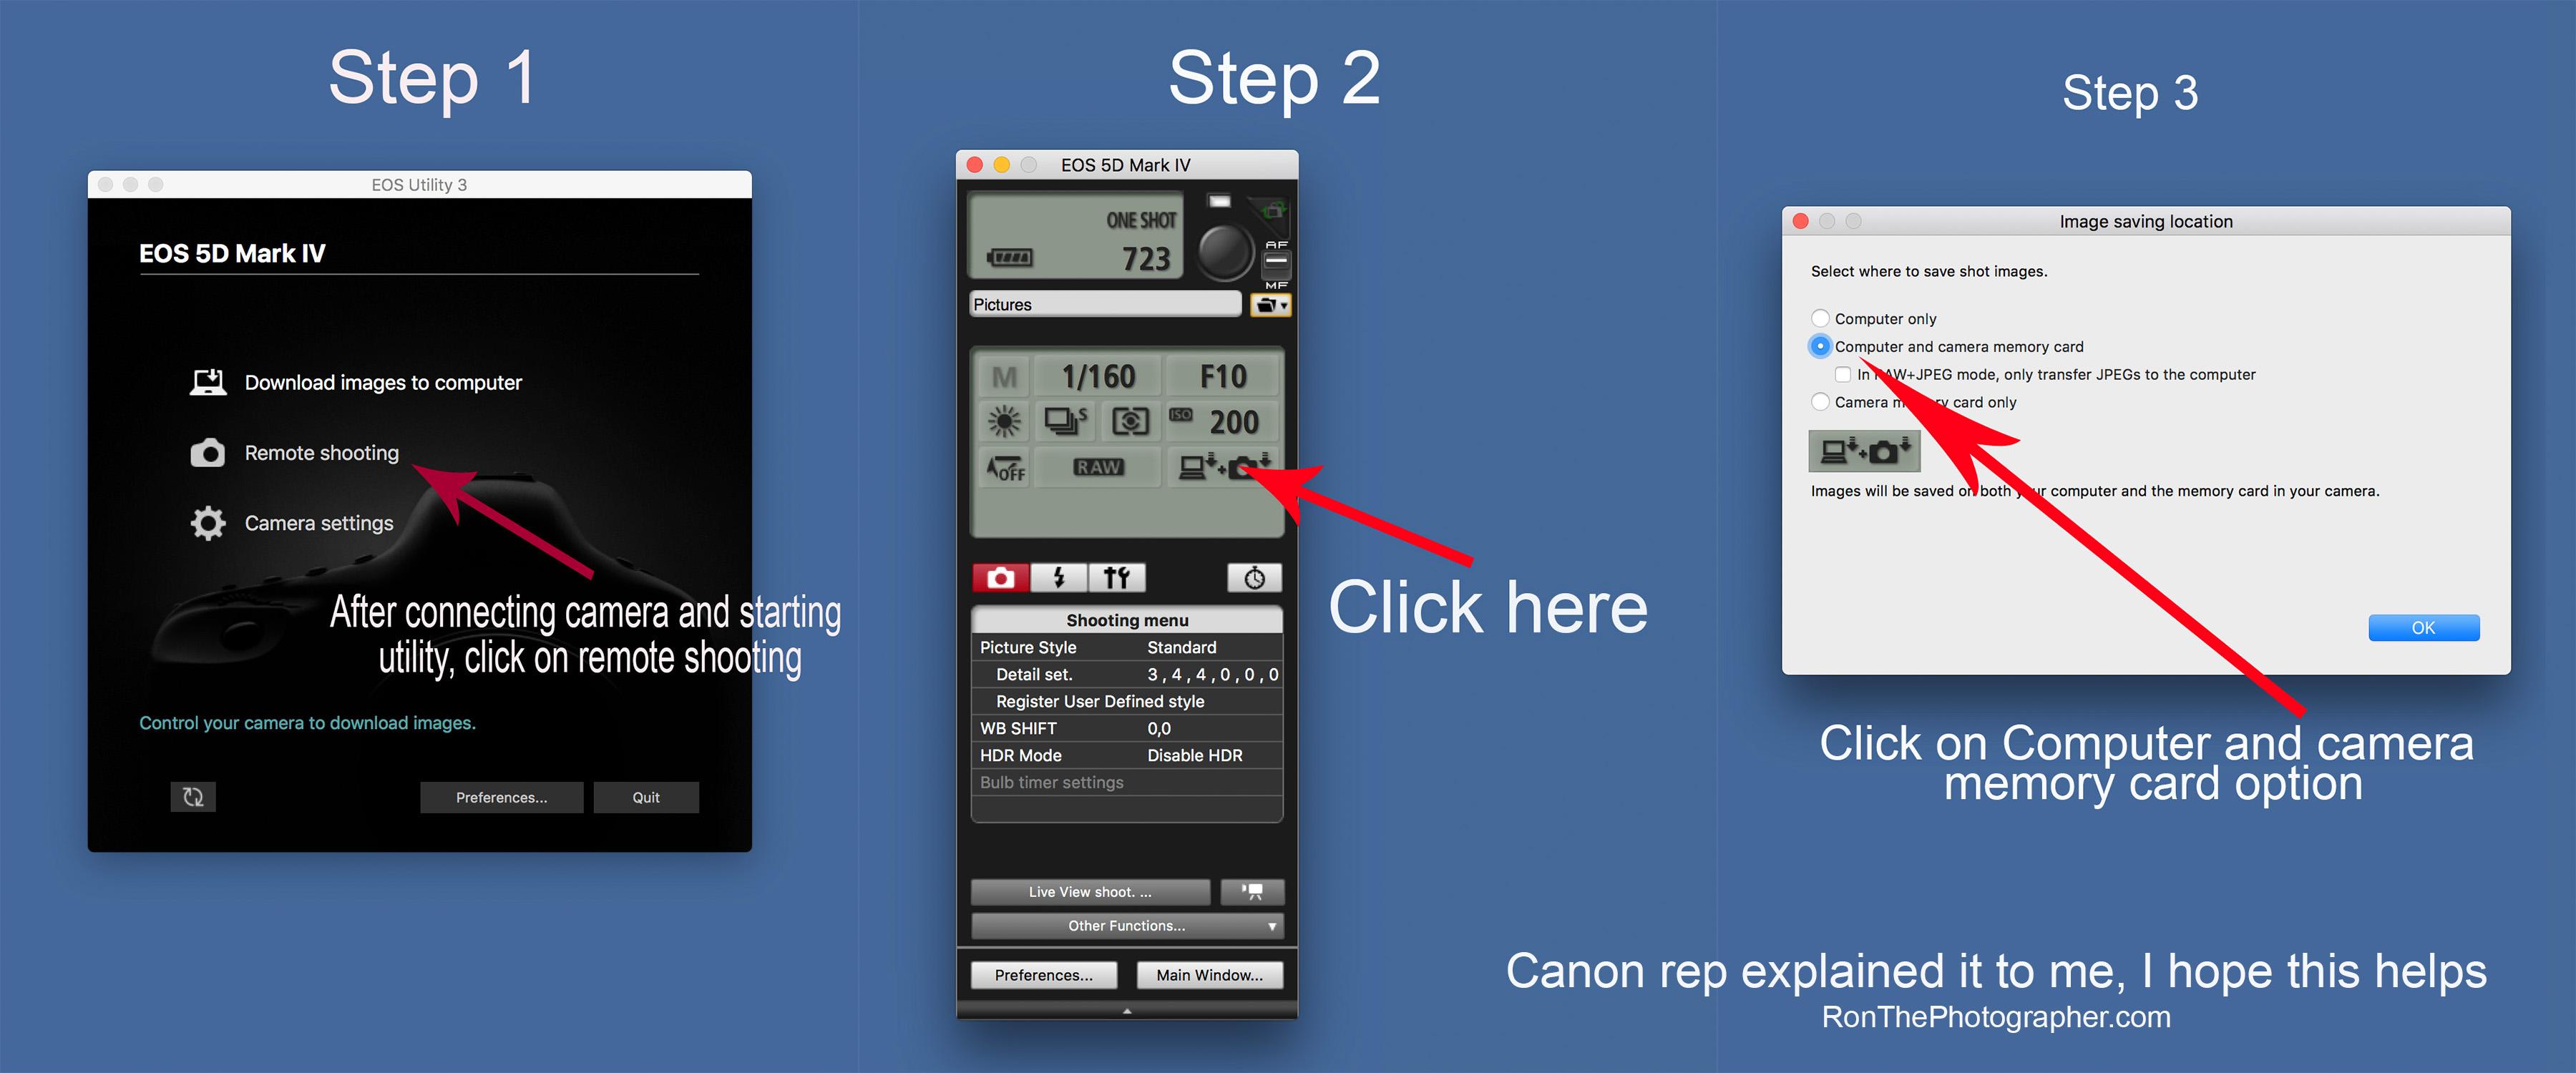 Canon Setting.jpg